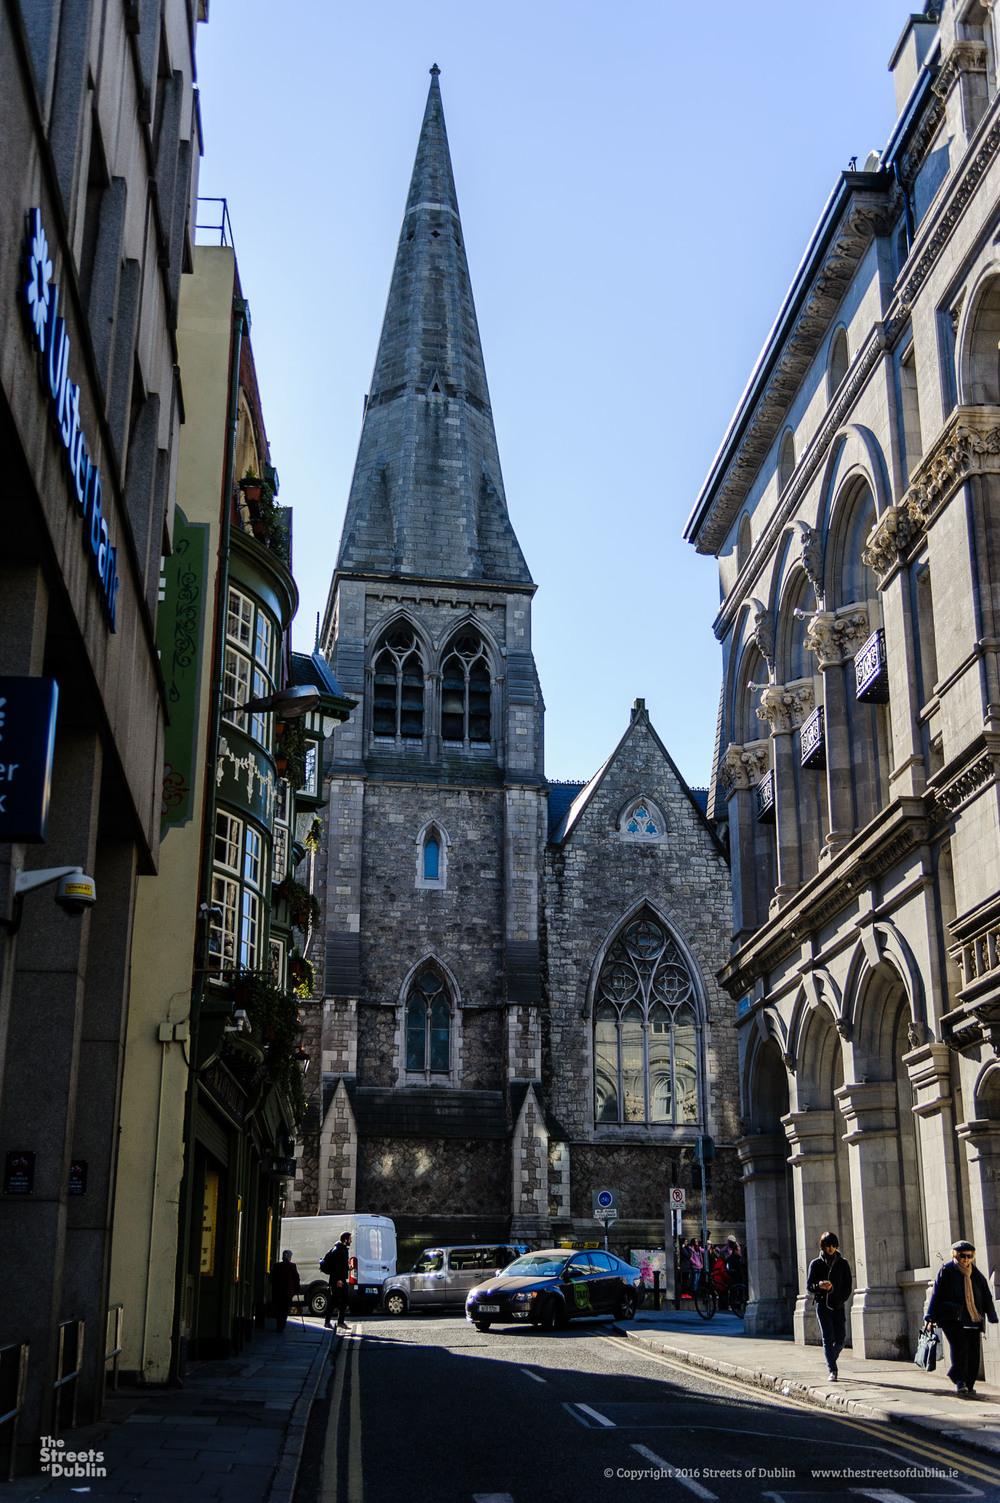 Streets-of-Dublin-Photo-1423.jpg